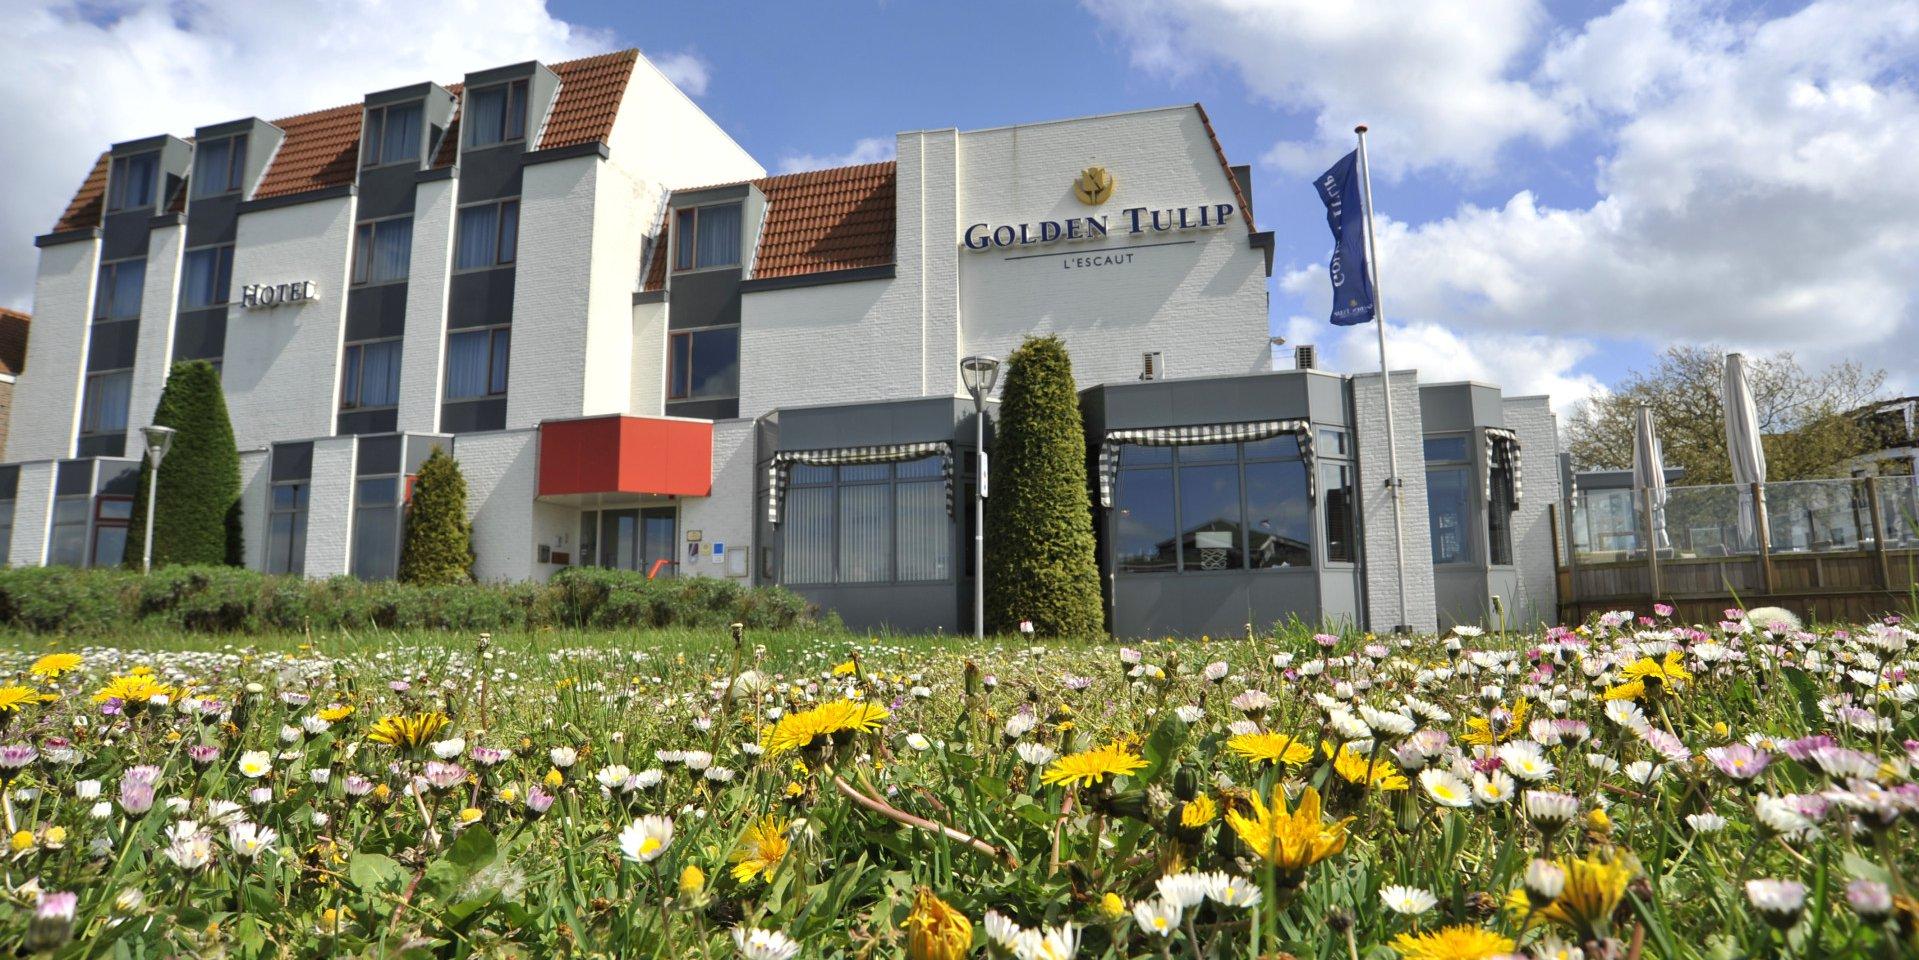 Golden Tulip Hotel L'Escaut Terneuzen